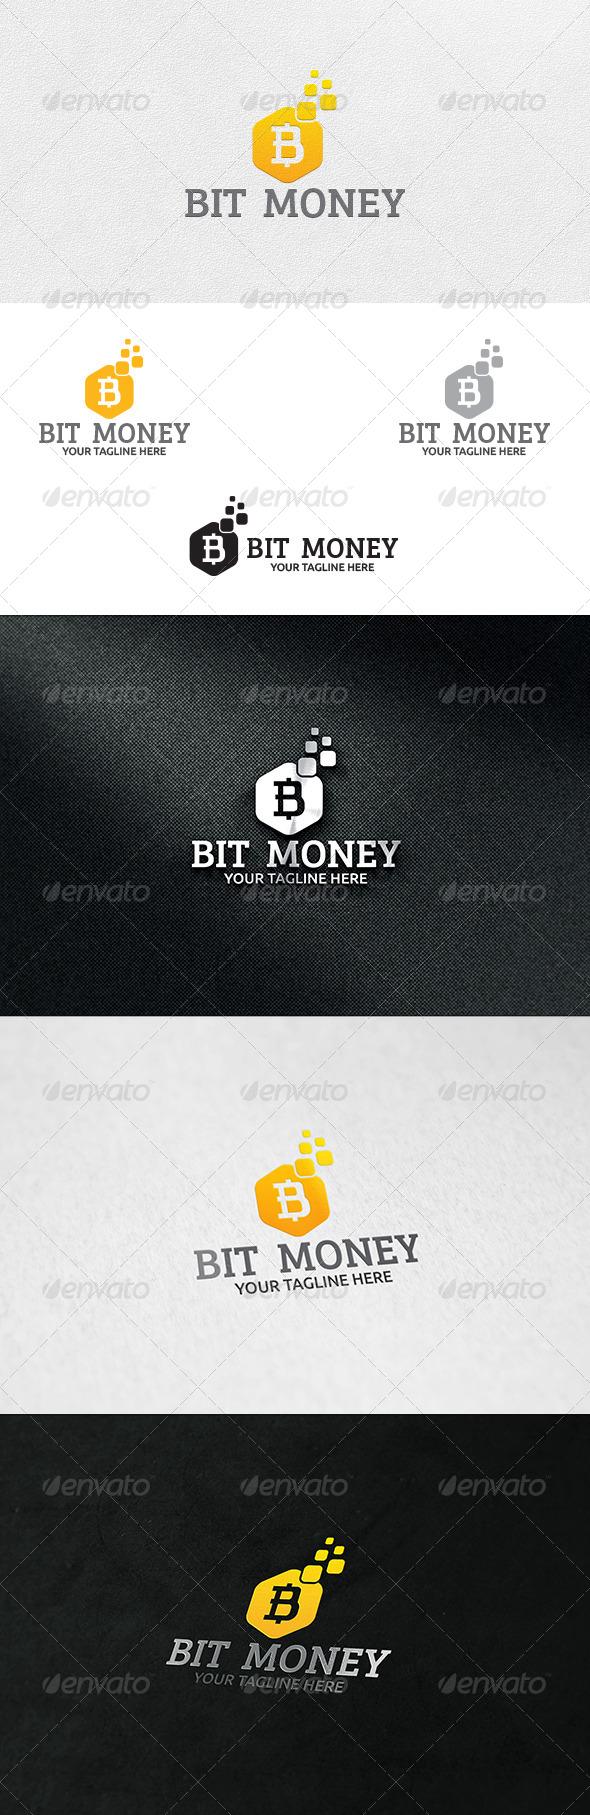 GraphicRiver Bit Money Logo Template 6703580